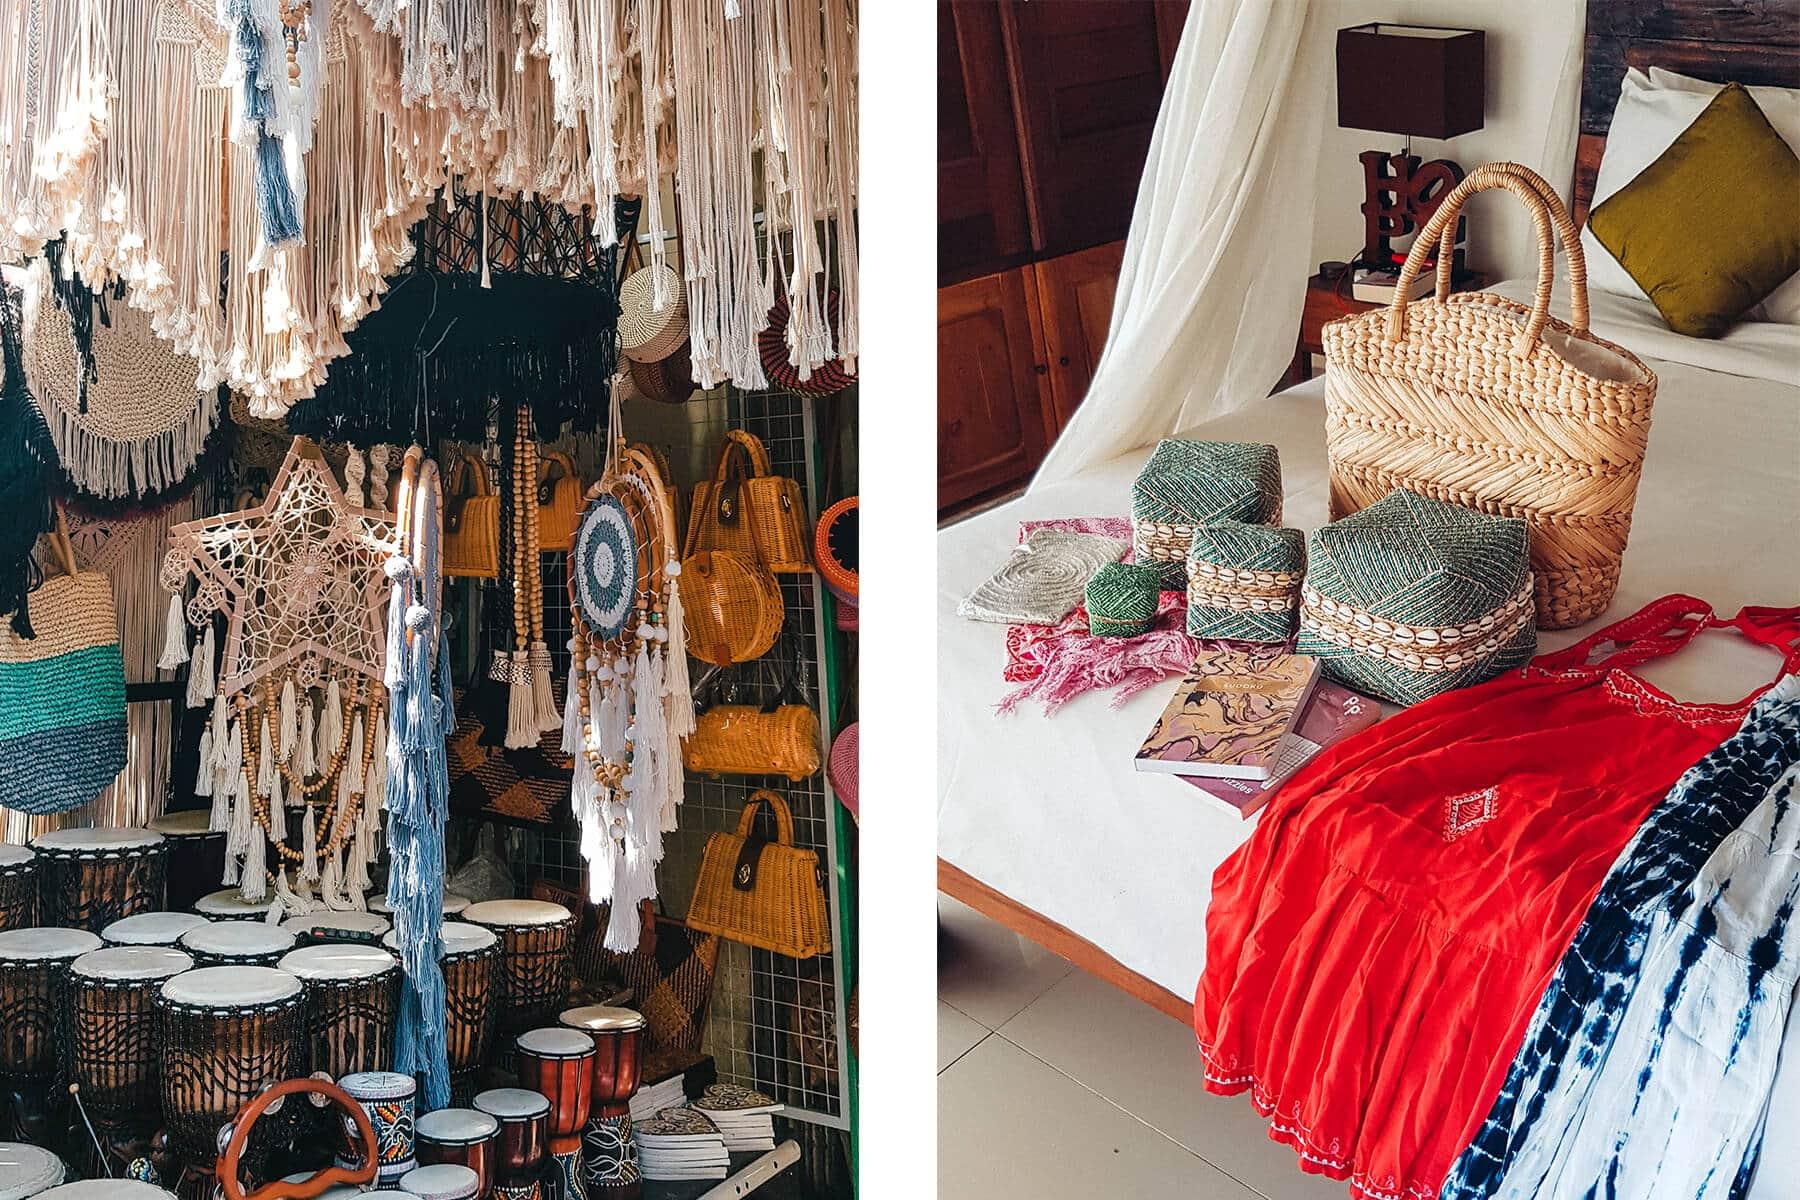 Island Life #4 - Shopping for macramé and rattan bags at Ubud Market